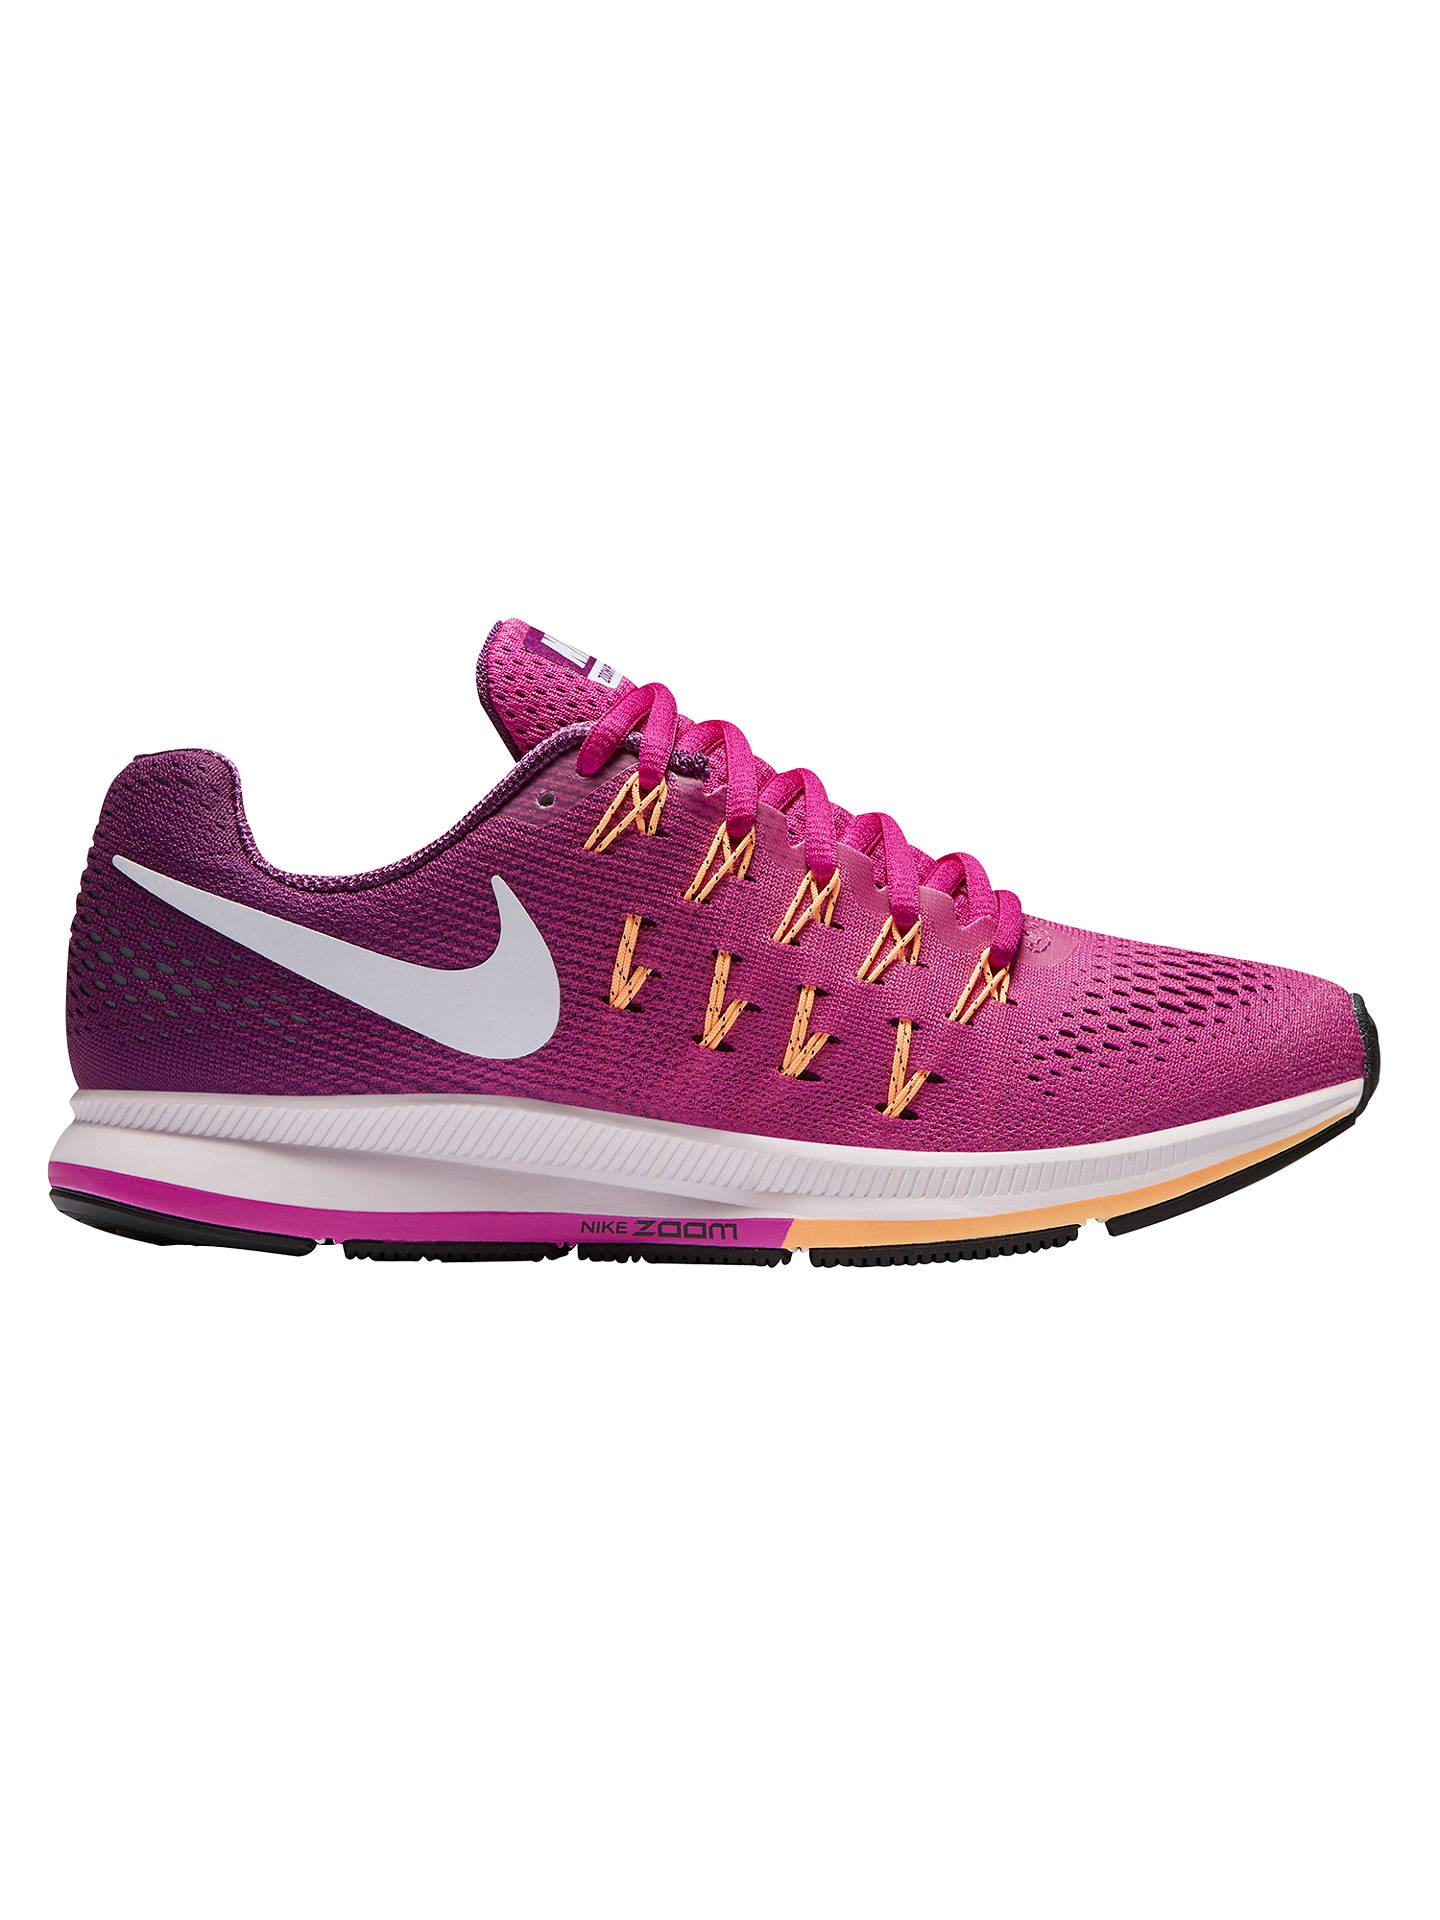 d32c29056234 Buy Nike Air Zoom Pegasus 33 Women s Running Shoes